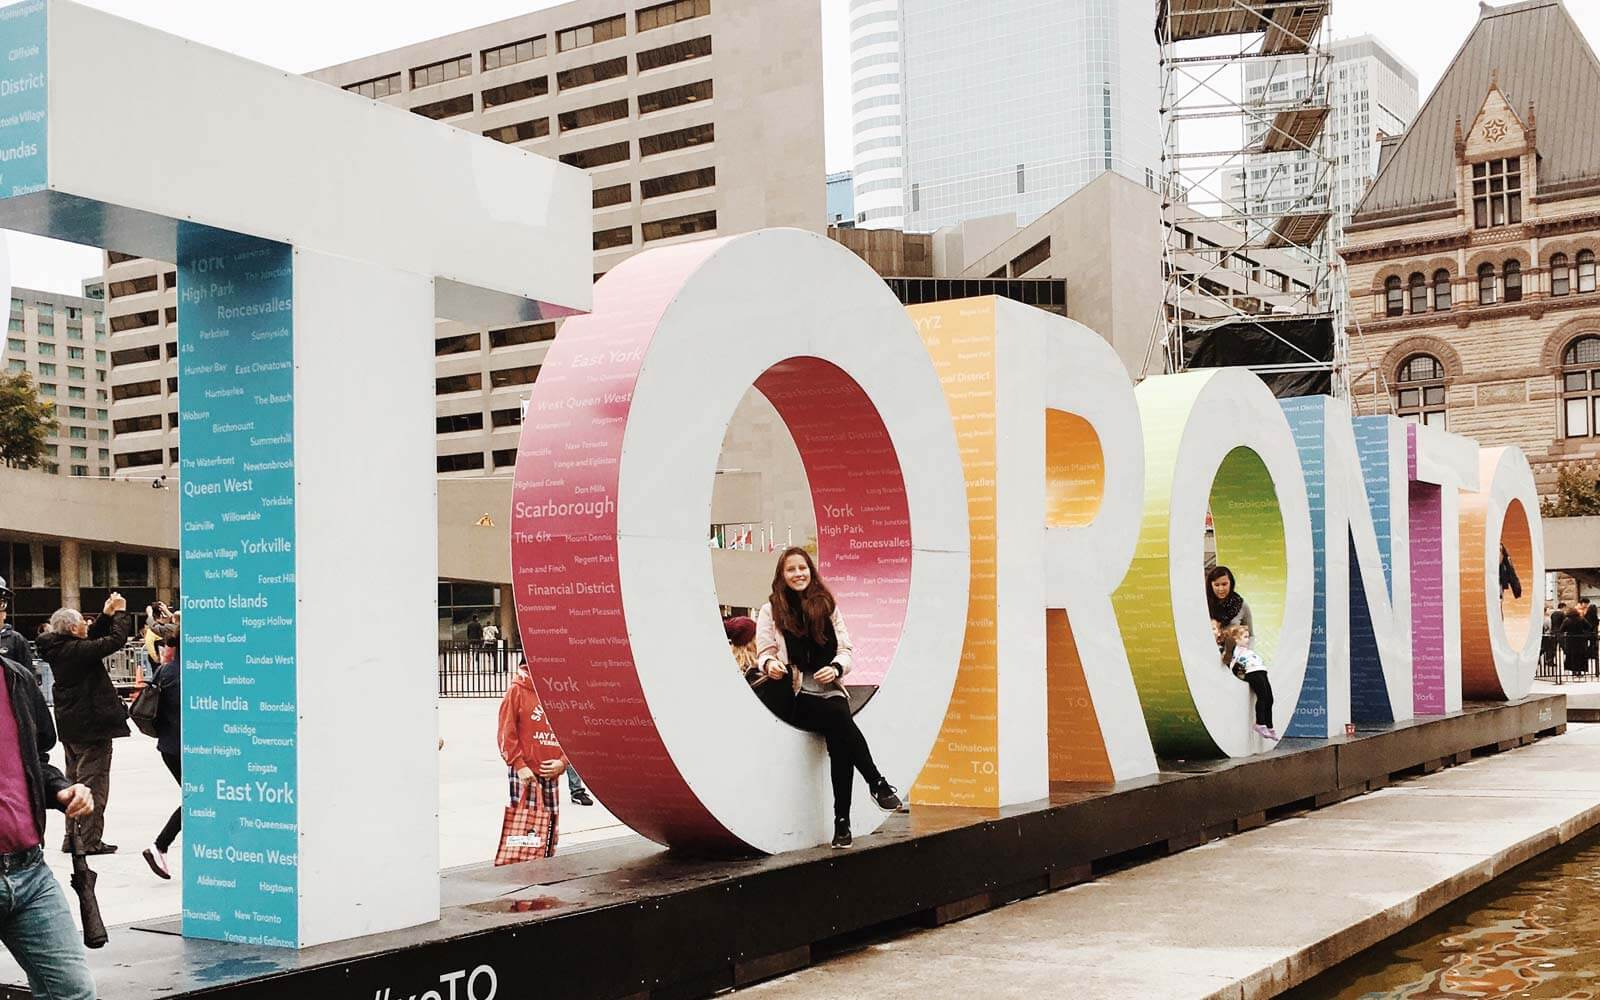 Astrid in Toronto